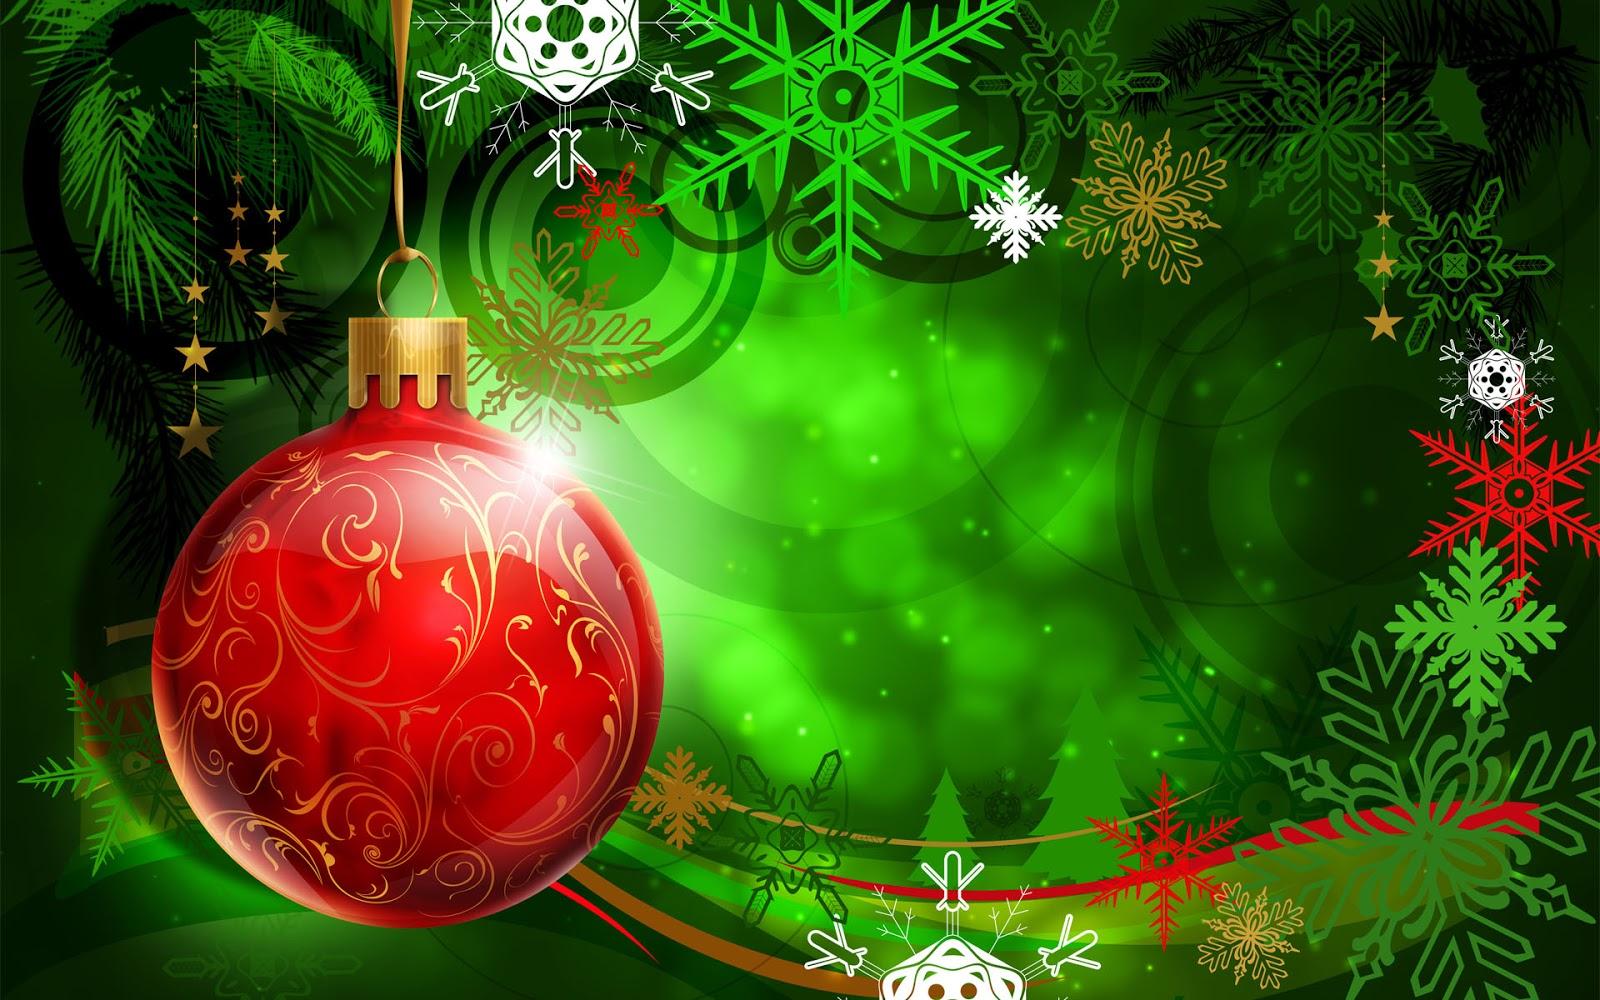 chirstmas: free christmas screensavers